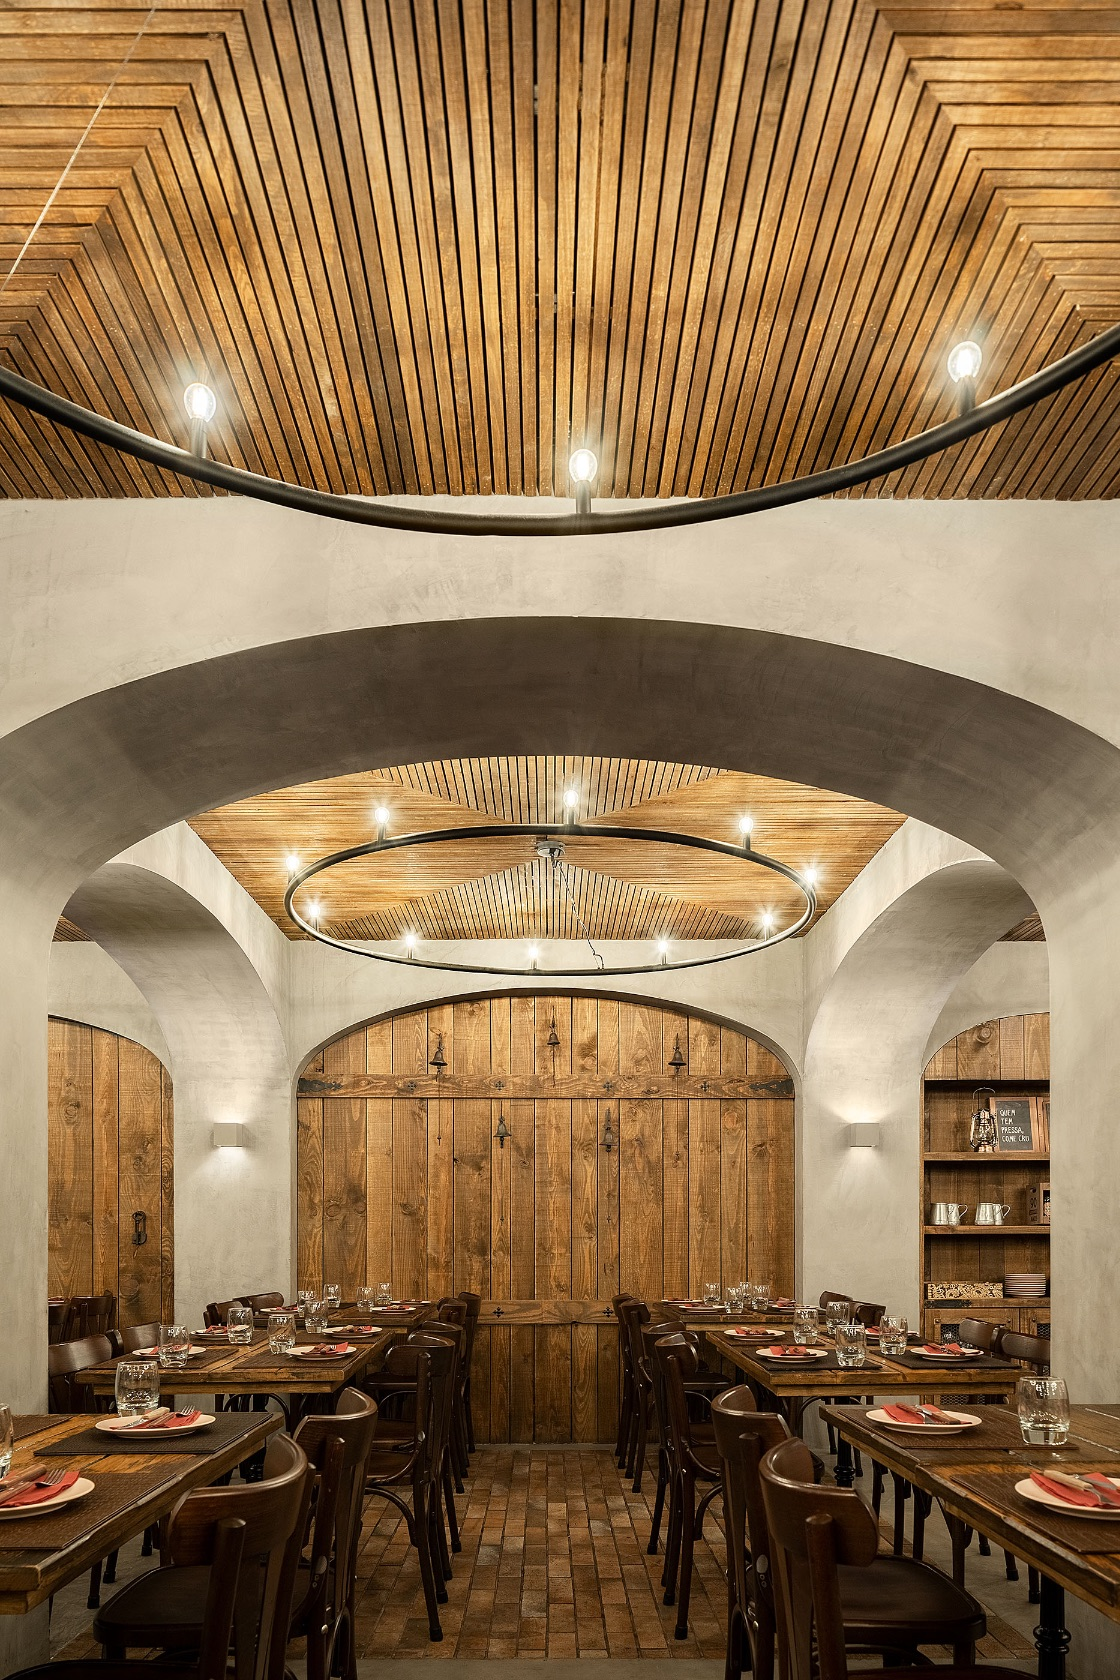 10_BARRIL Restaurant_PAULO MERLINI Architects_Inspirationist